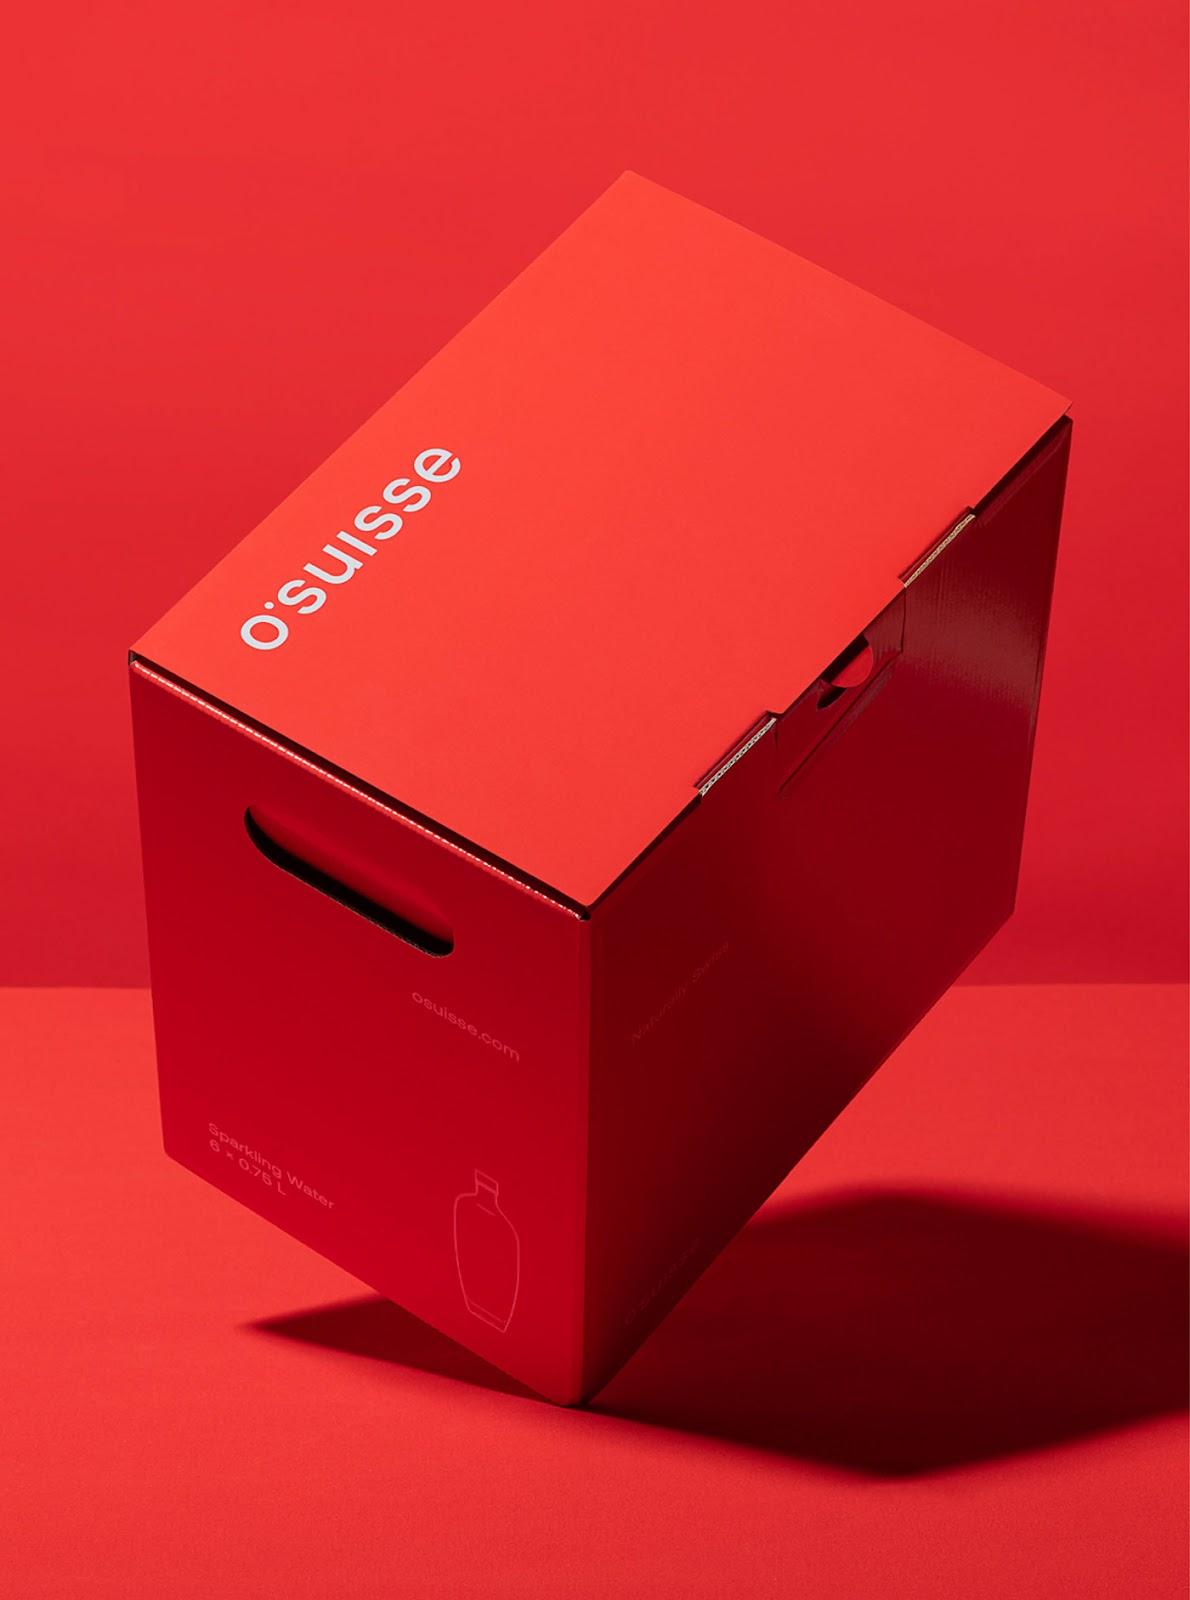 branding  Corporate Design fedrigoni food and beverages gmund product design  produkt design Switzerland typography   water